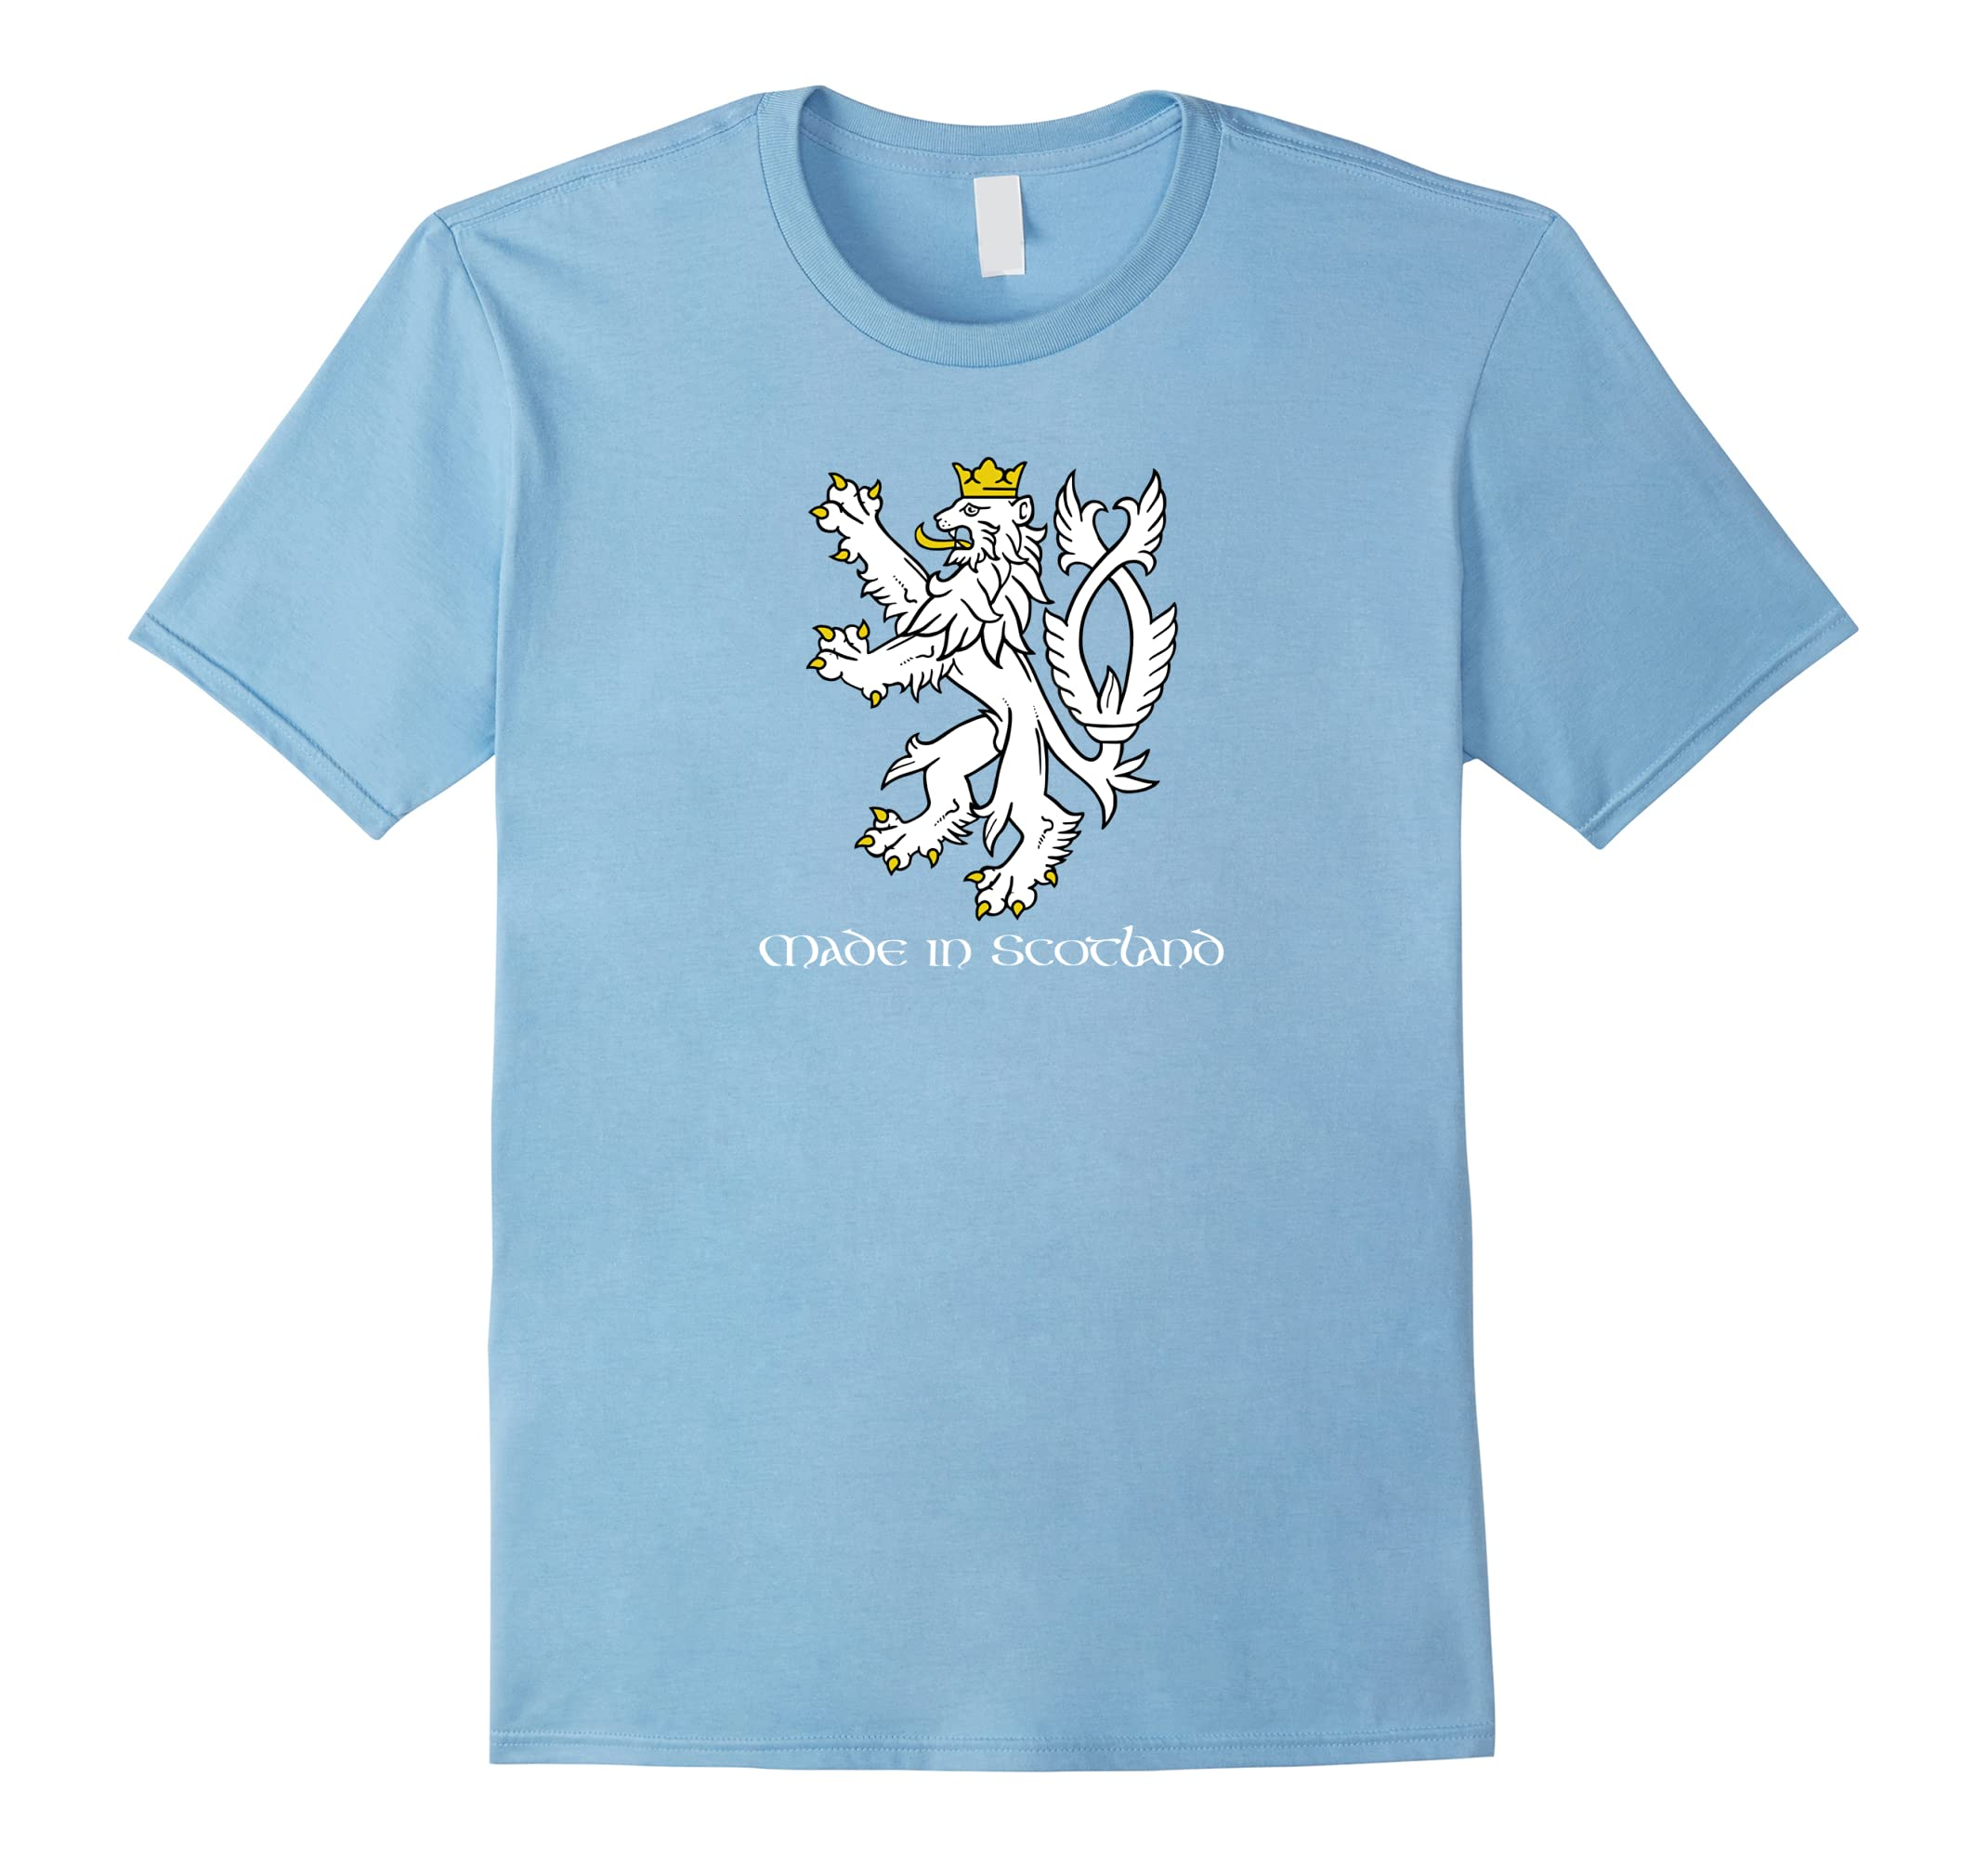 678e91fd12 Made in Scotland-ah my shirt one gift – Ahmyshirt